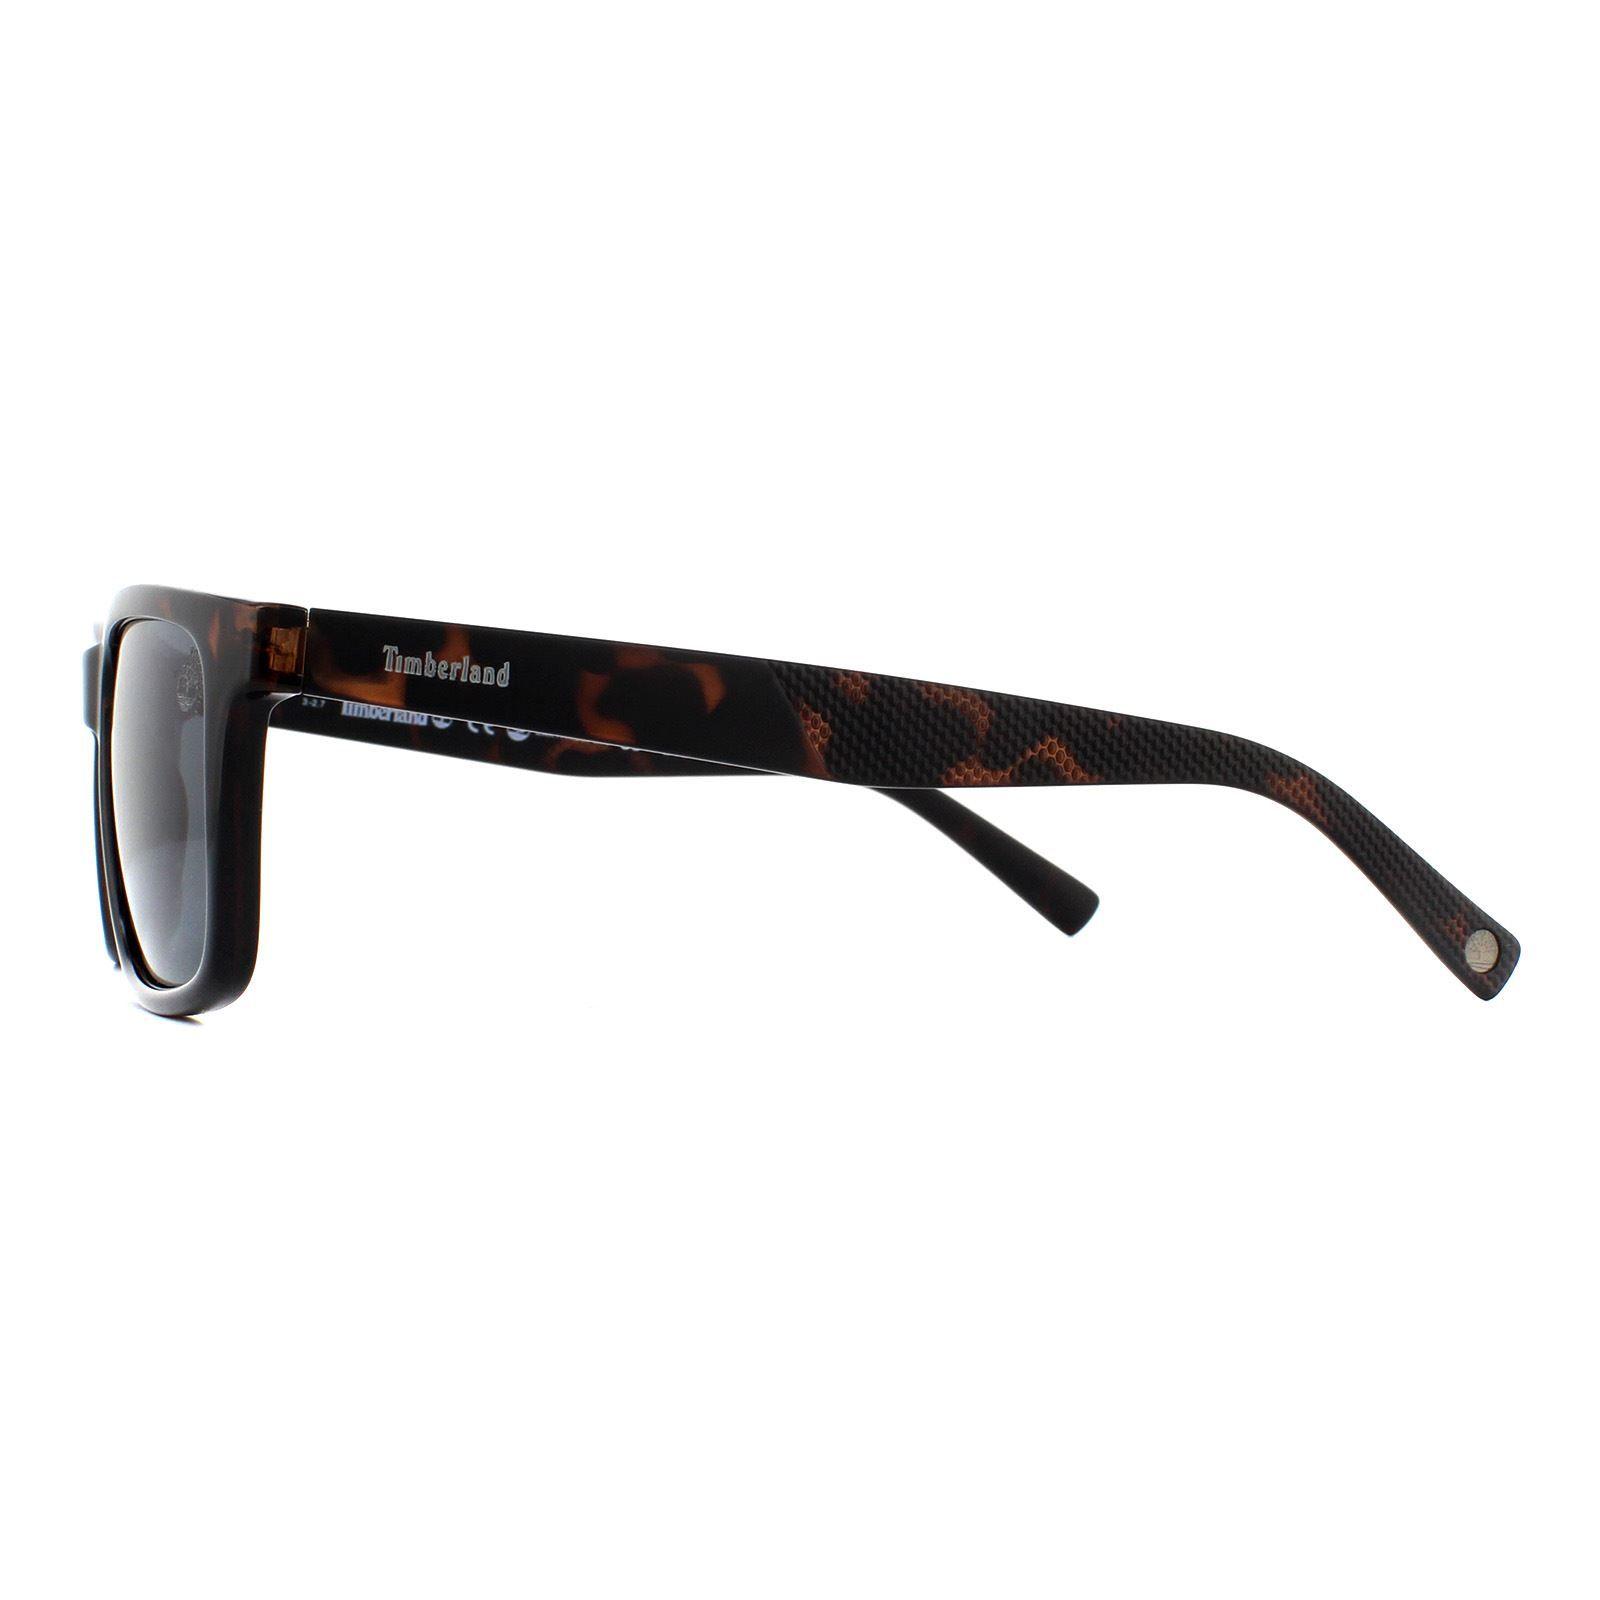 Timberland Sunglasses TB9125 52D Dark Havana Grey Polarized